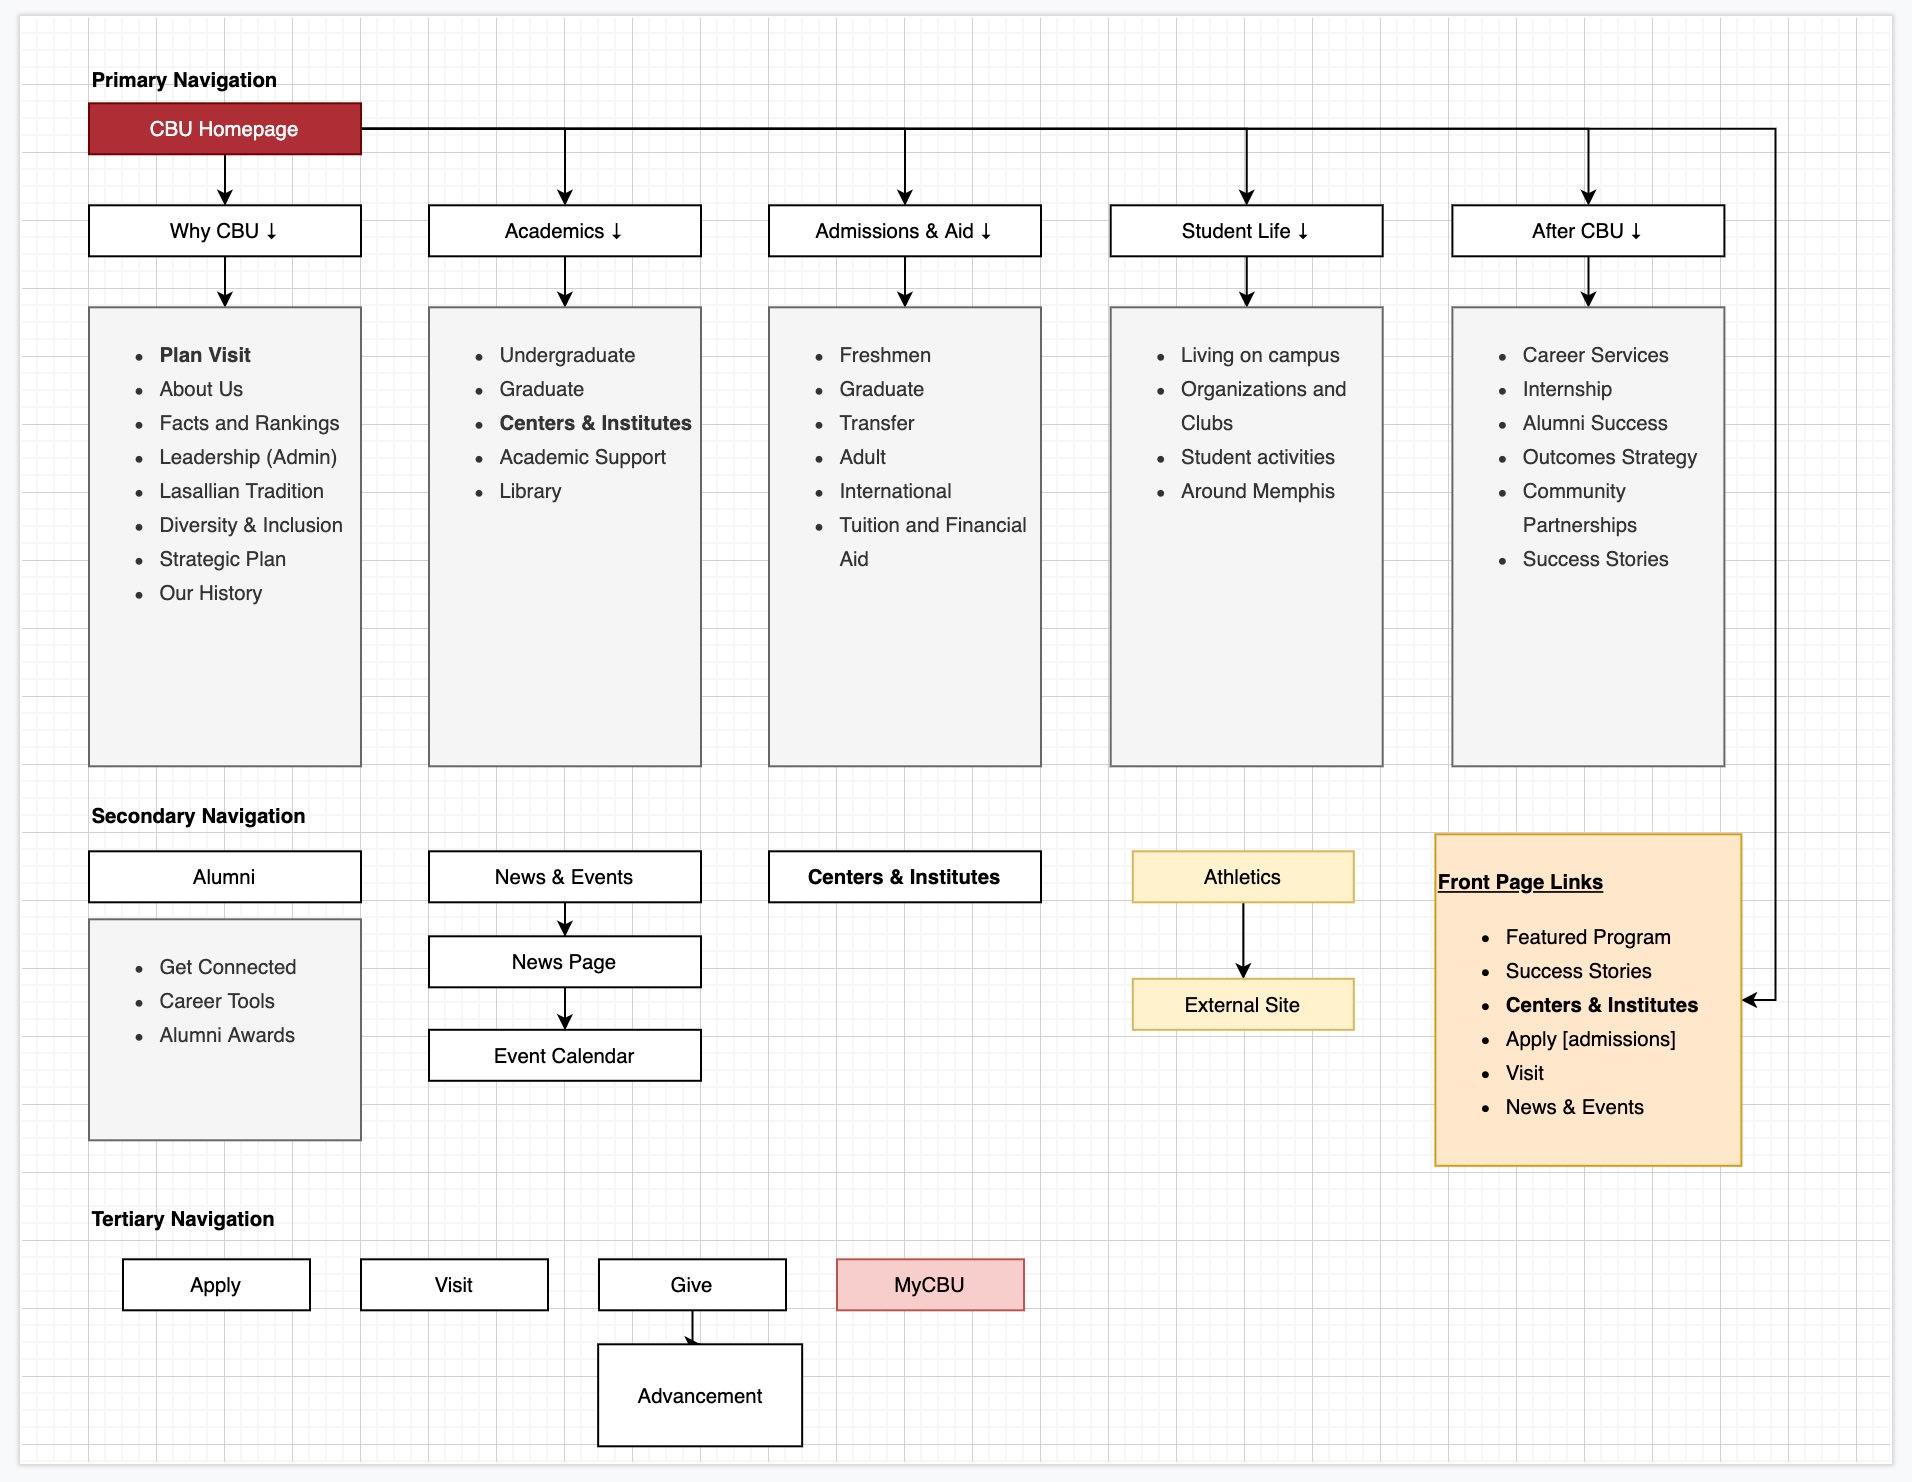 Information Architecture Exploration for CBU